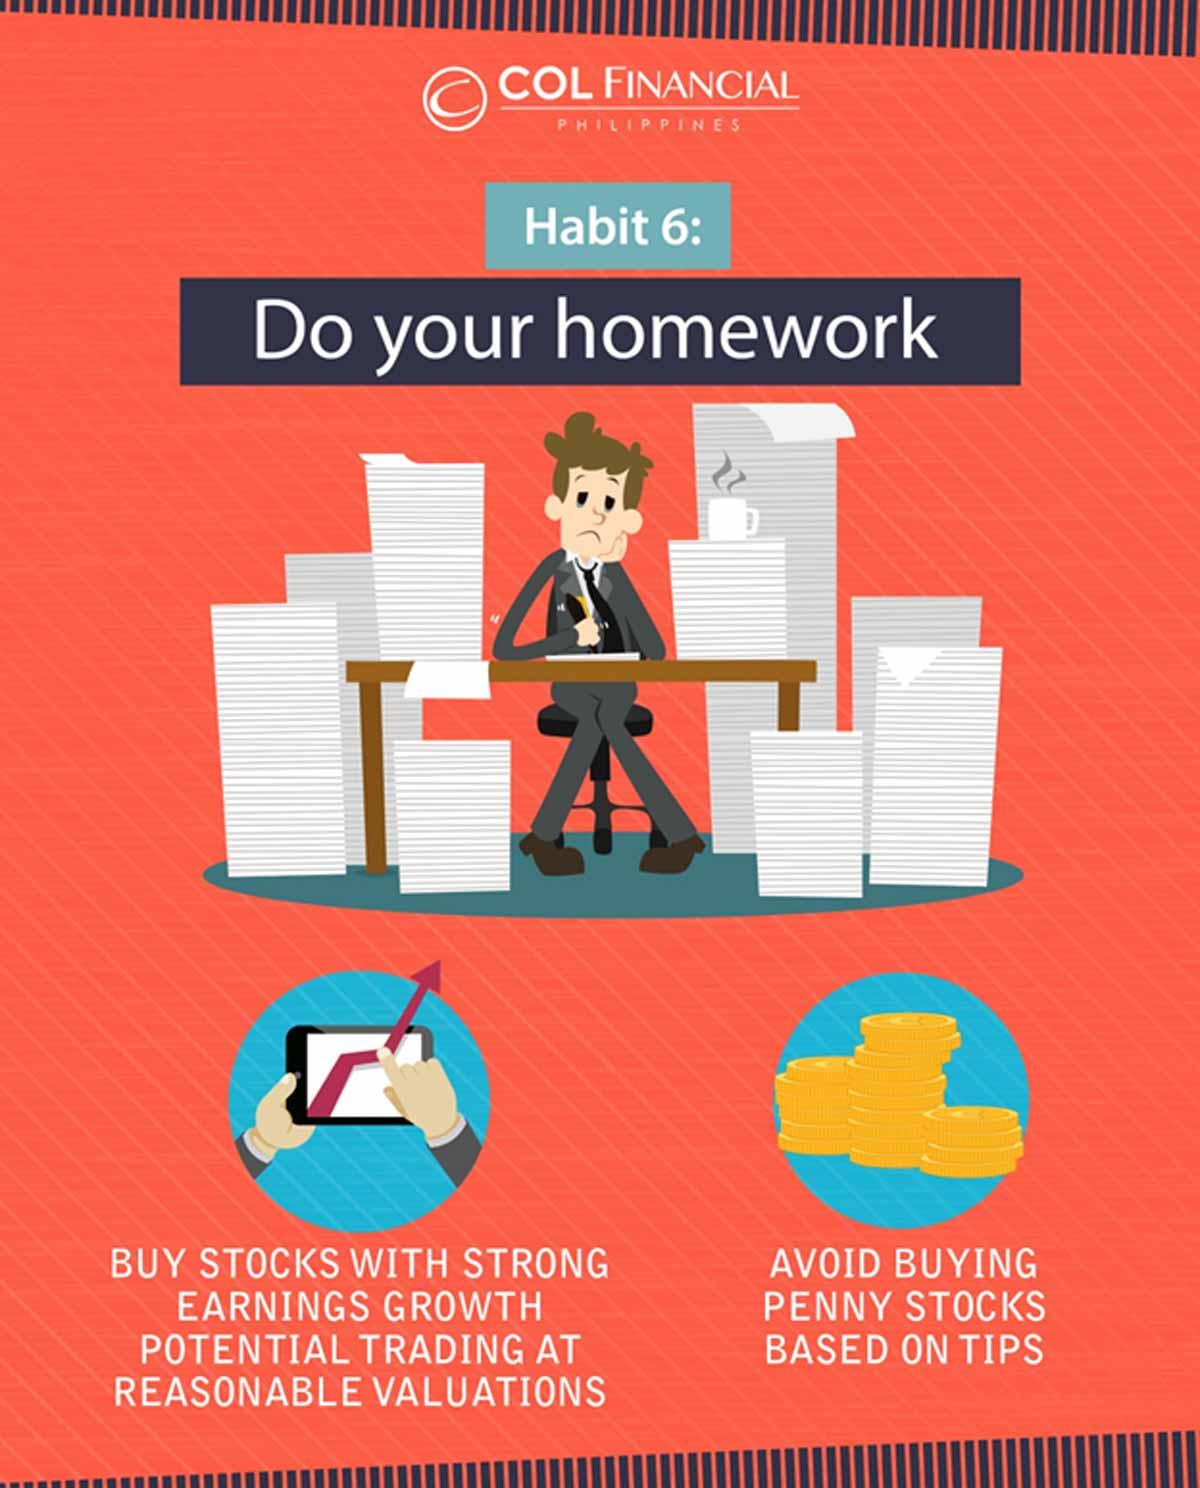 10-habits-of-happy-investors-col-financial-do-your-homework